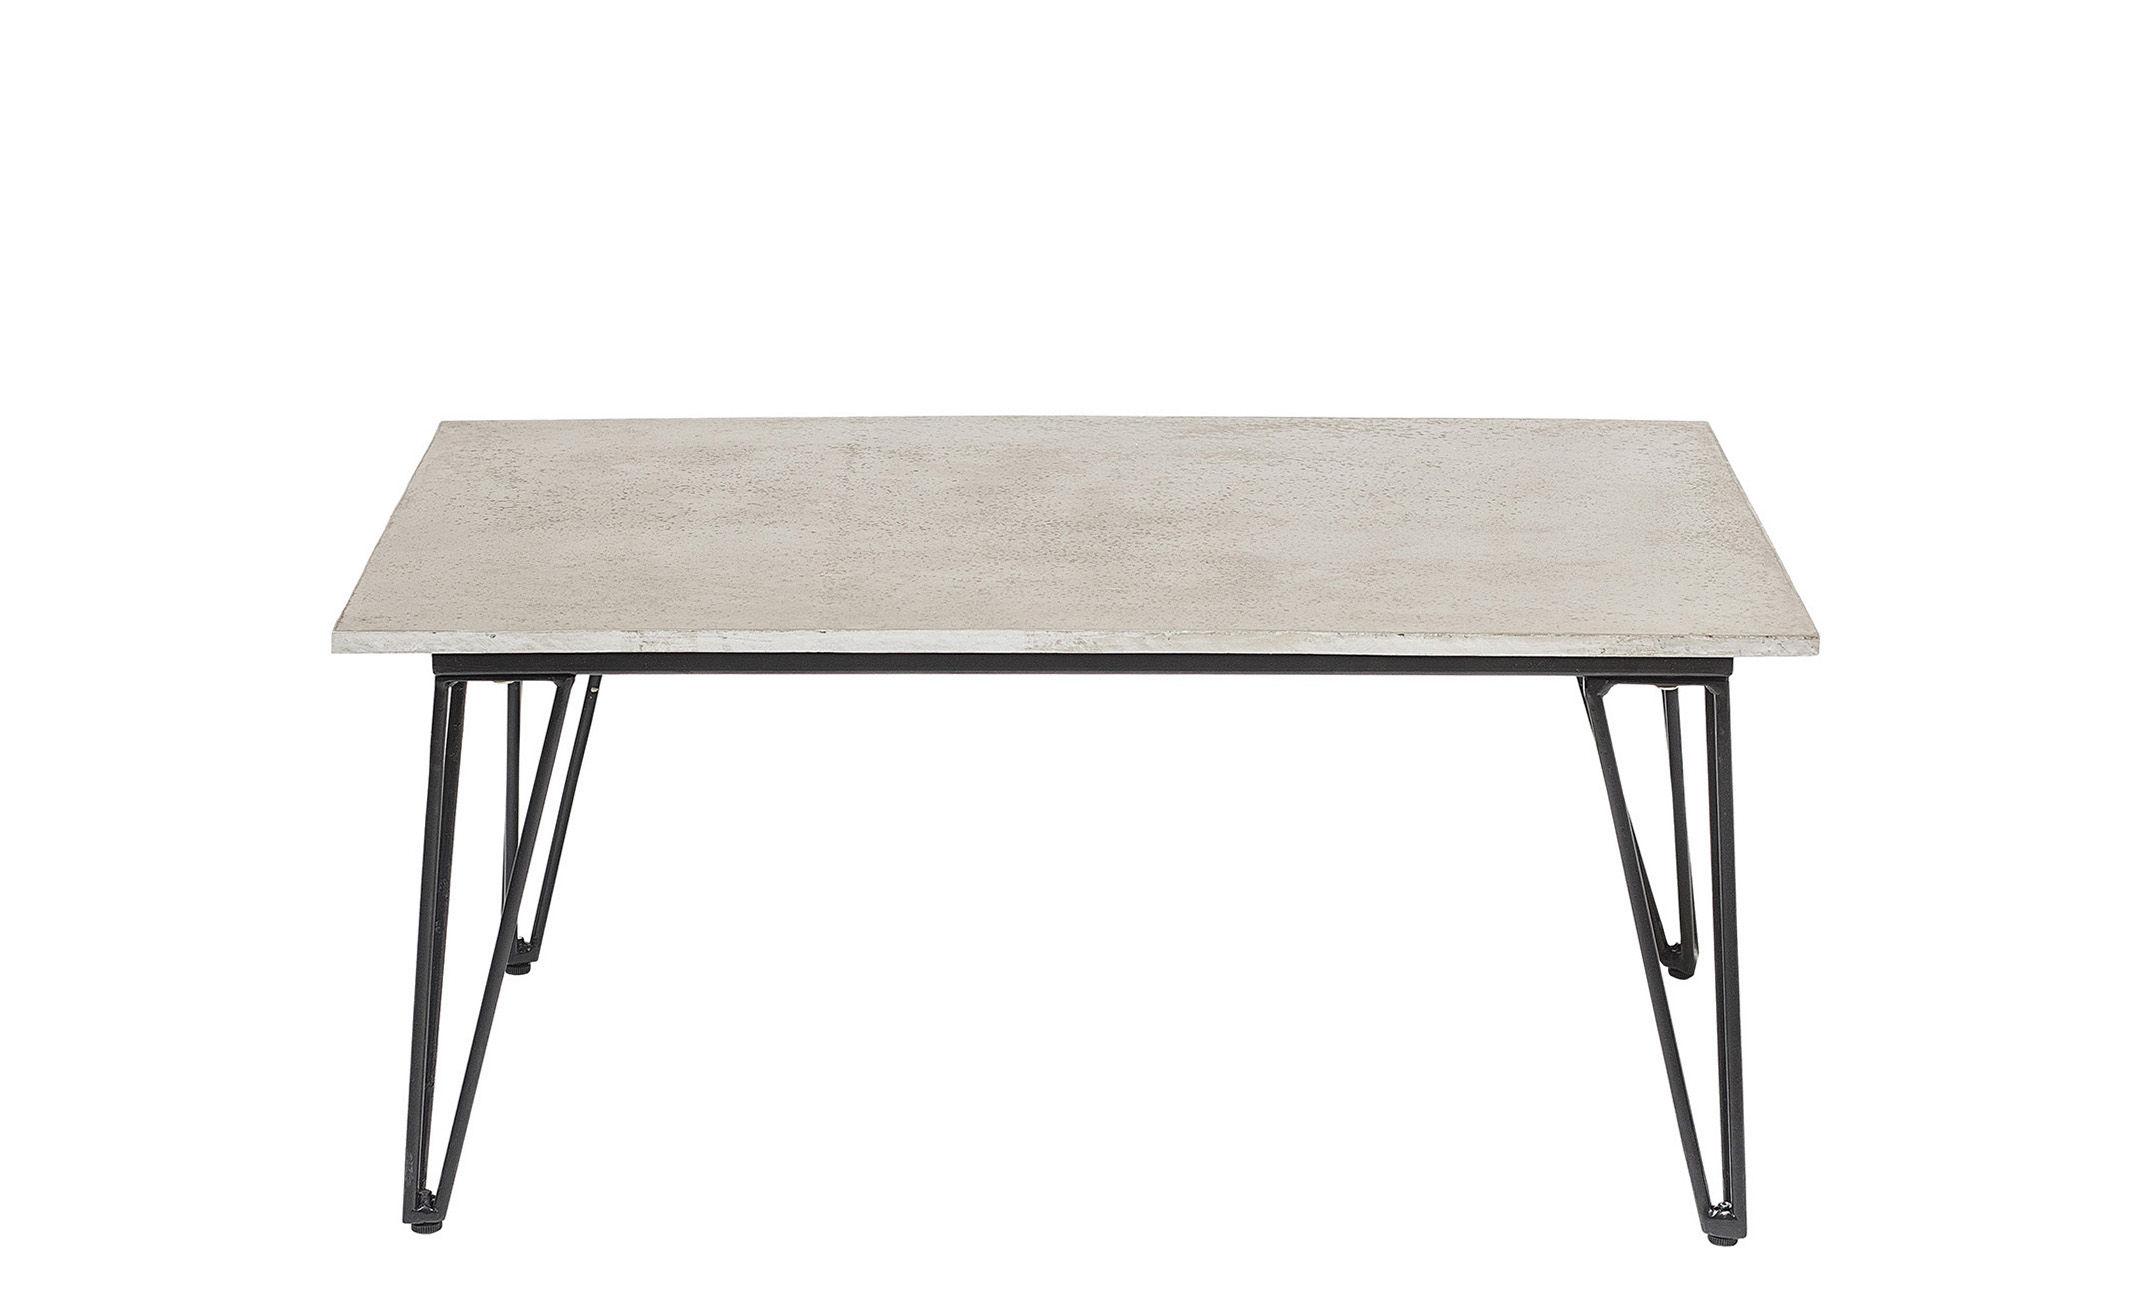 Furniture - Coffee Tables - Concrete Coffee table - / Concrete - 90 x 60 cm by Bloomingville - Grey concrete / Black - Concrete, Lacquered steel